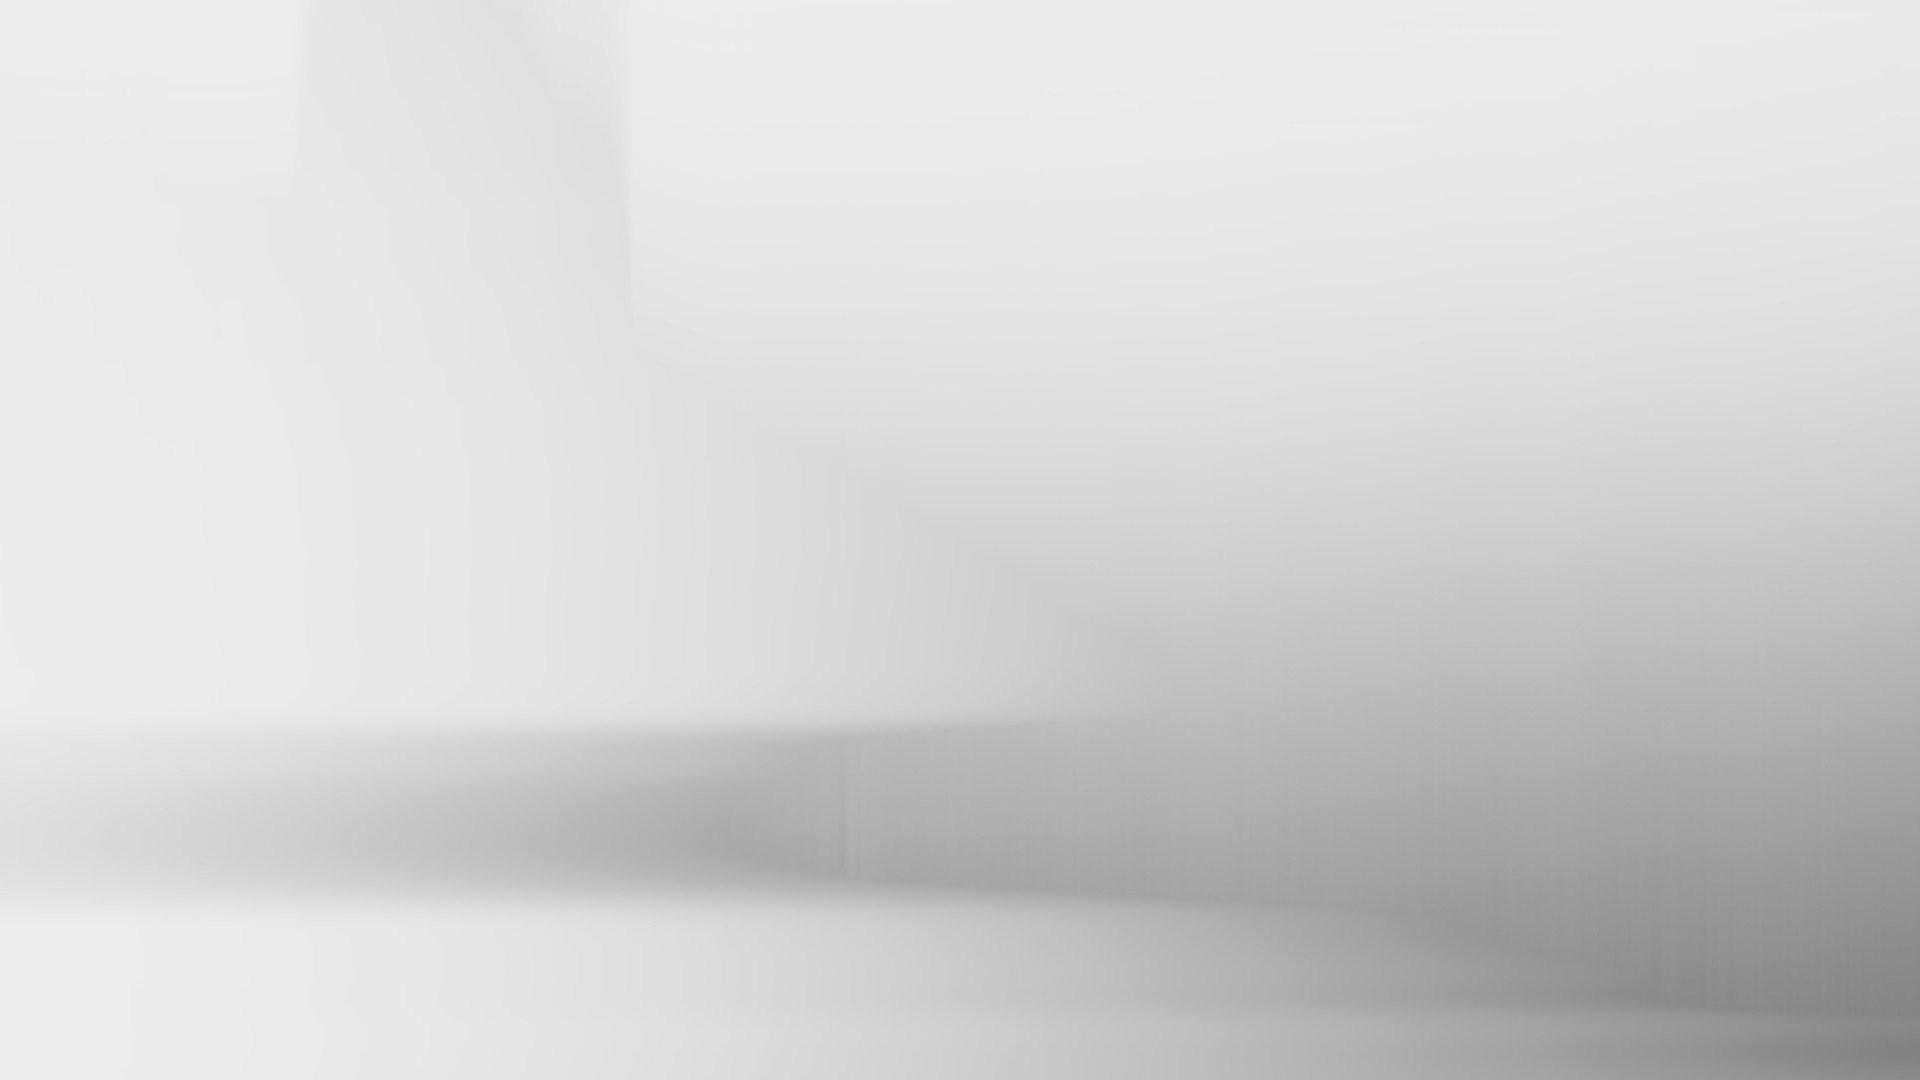 Silver White Background …